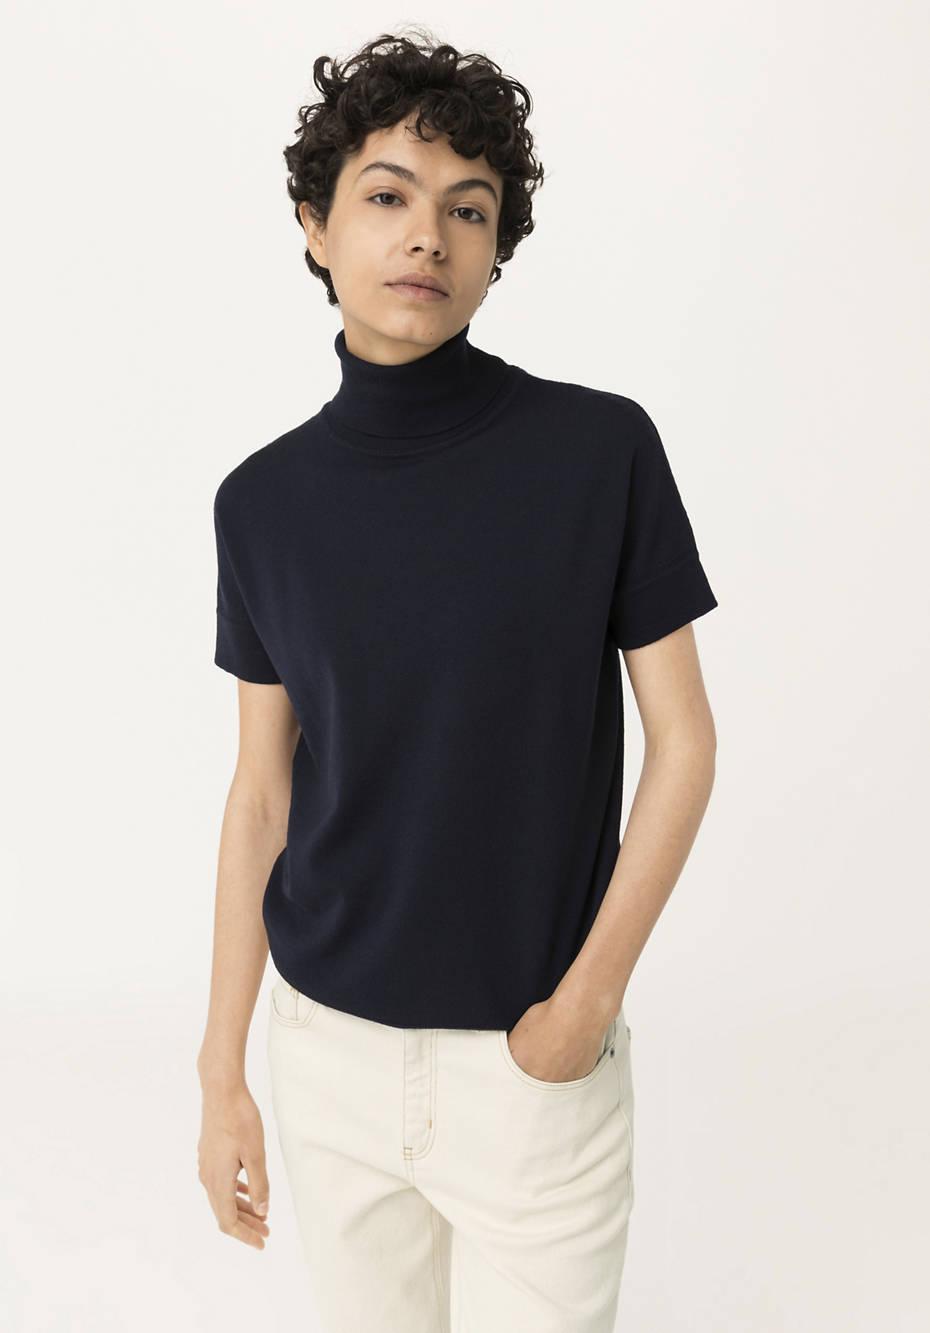 Short-sleeved sweater made from pure organic merino wool